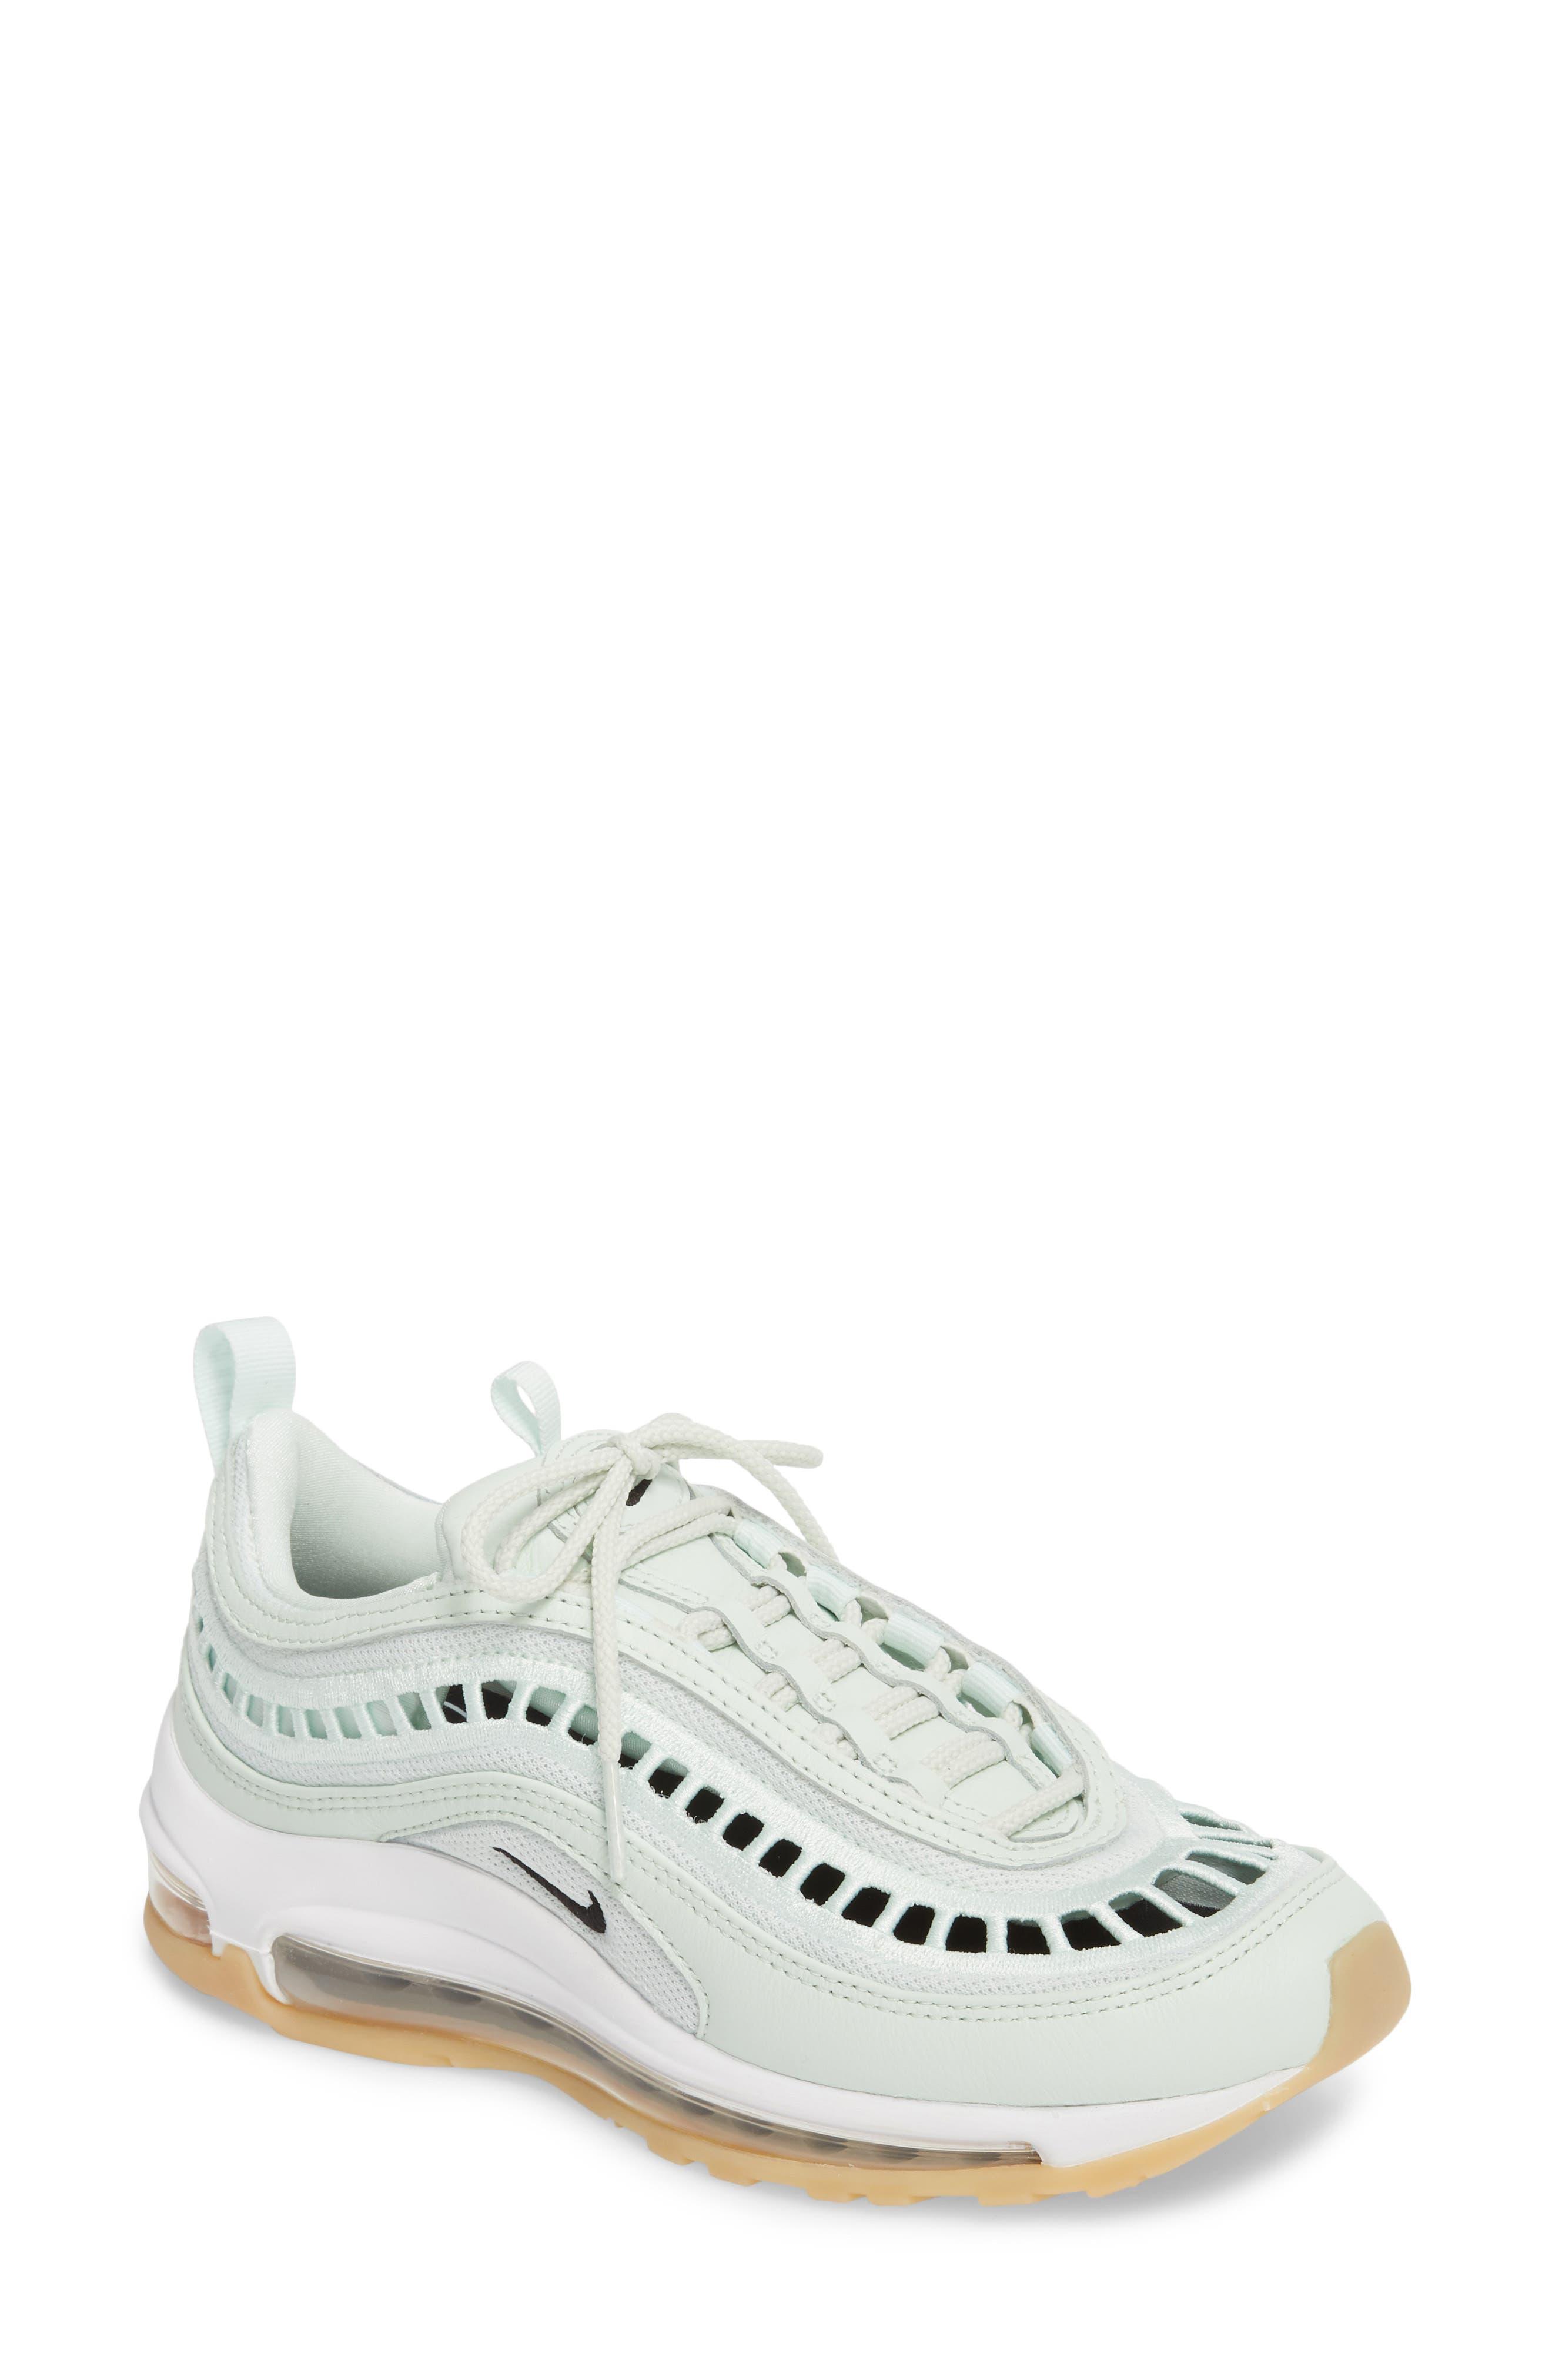 Nike Air Max 97 Ultra '17 SI Sneaker (Women)